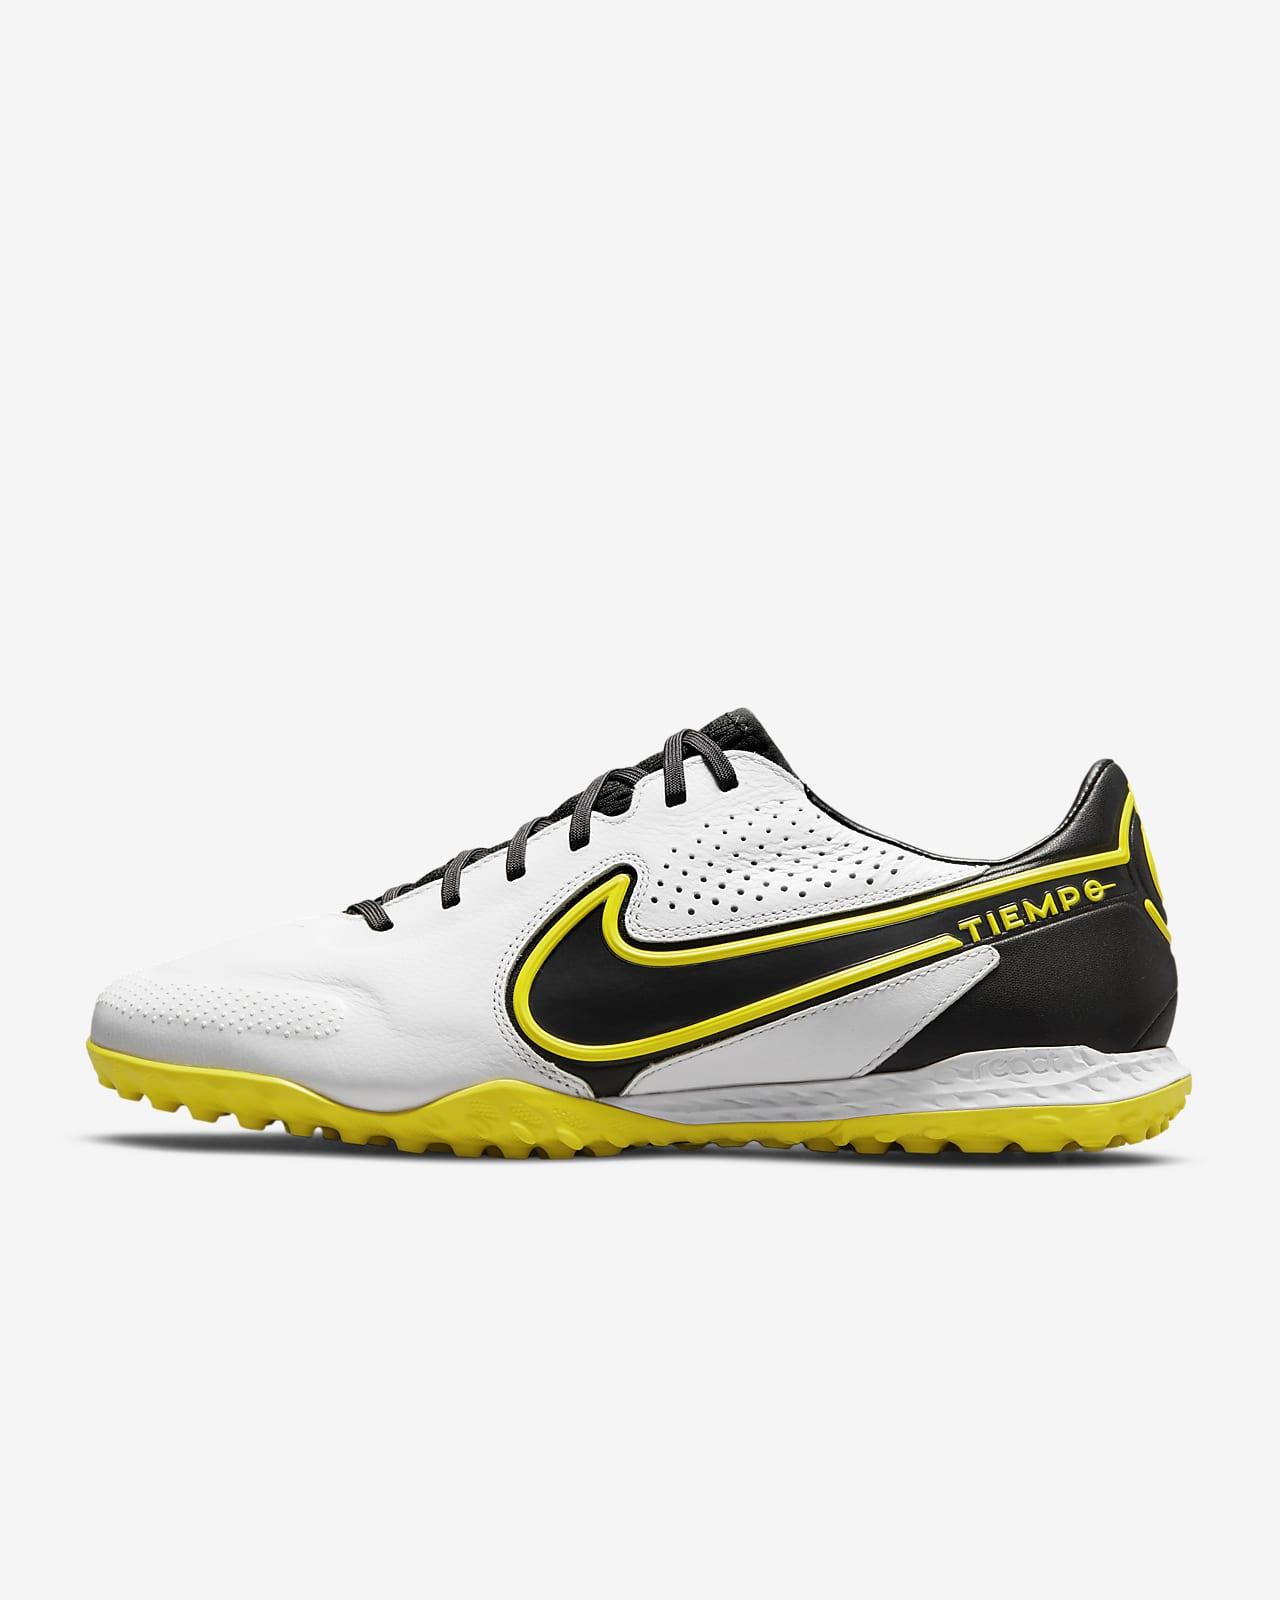 Nike React Tiempo Legend 9 Pro TF Turf Football Shoe. Nike LU